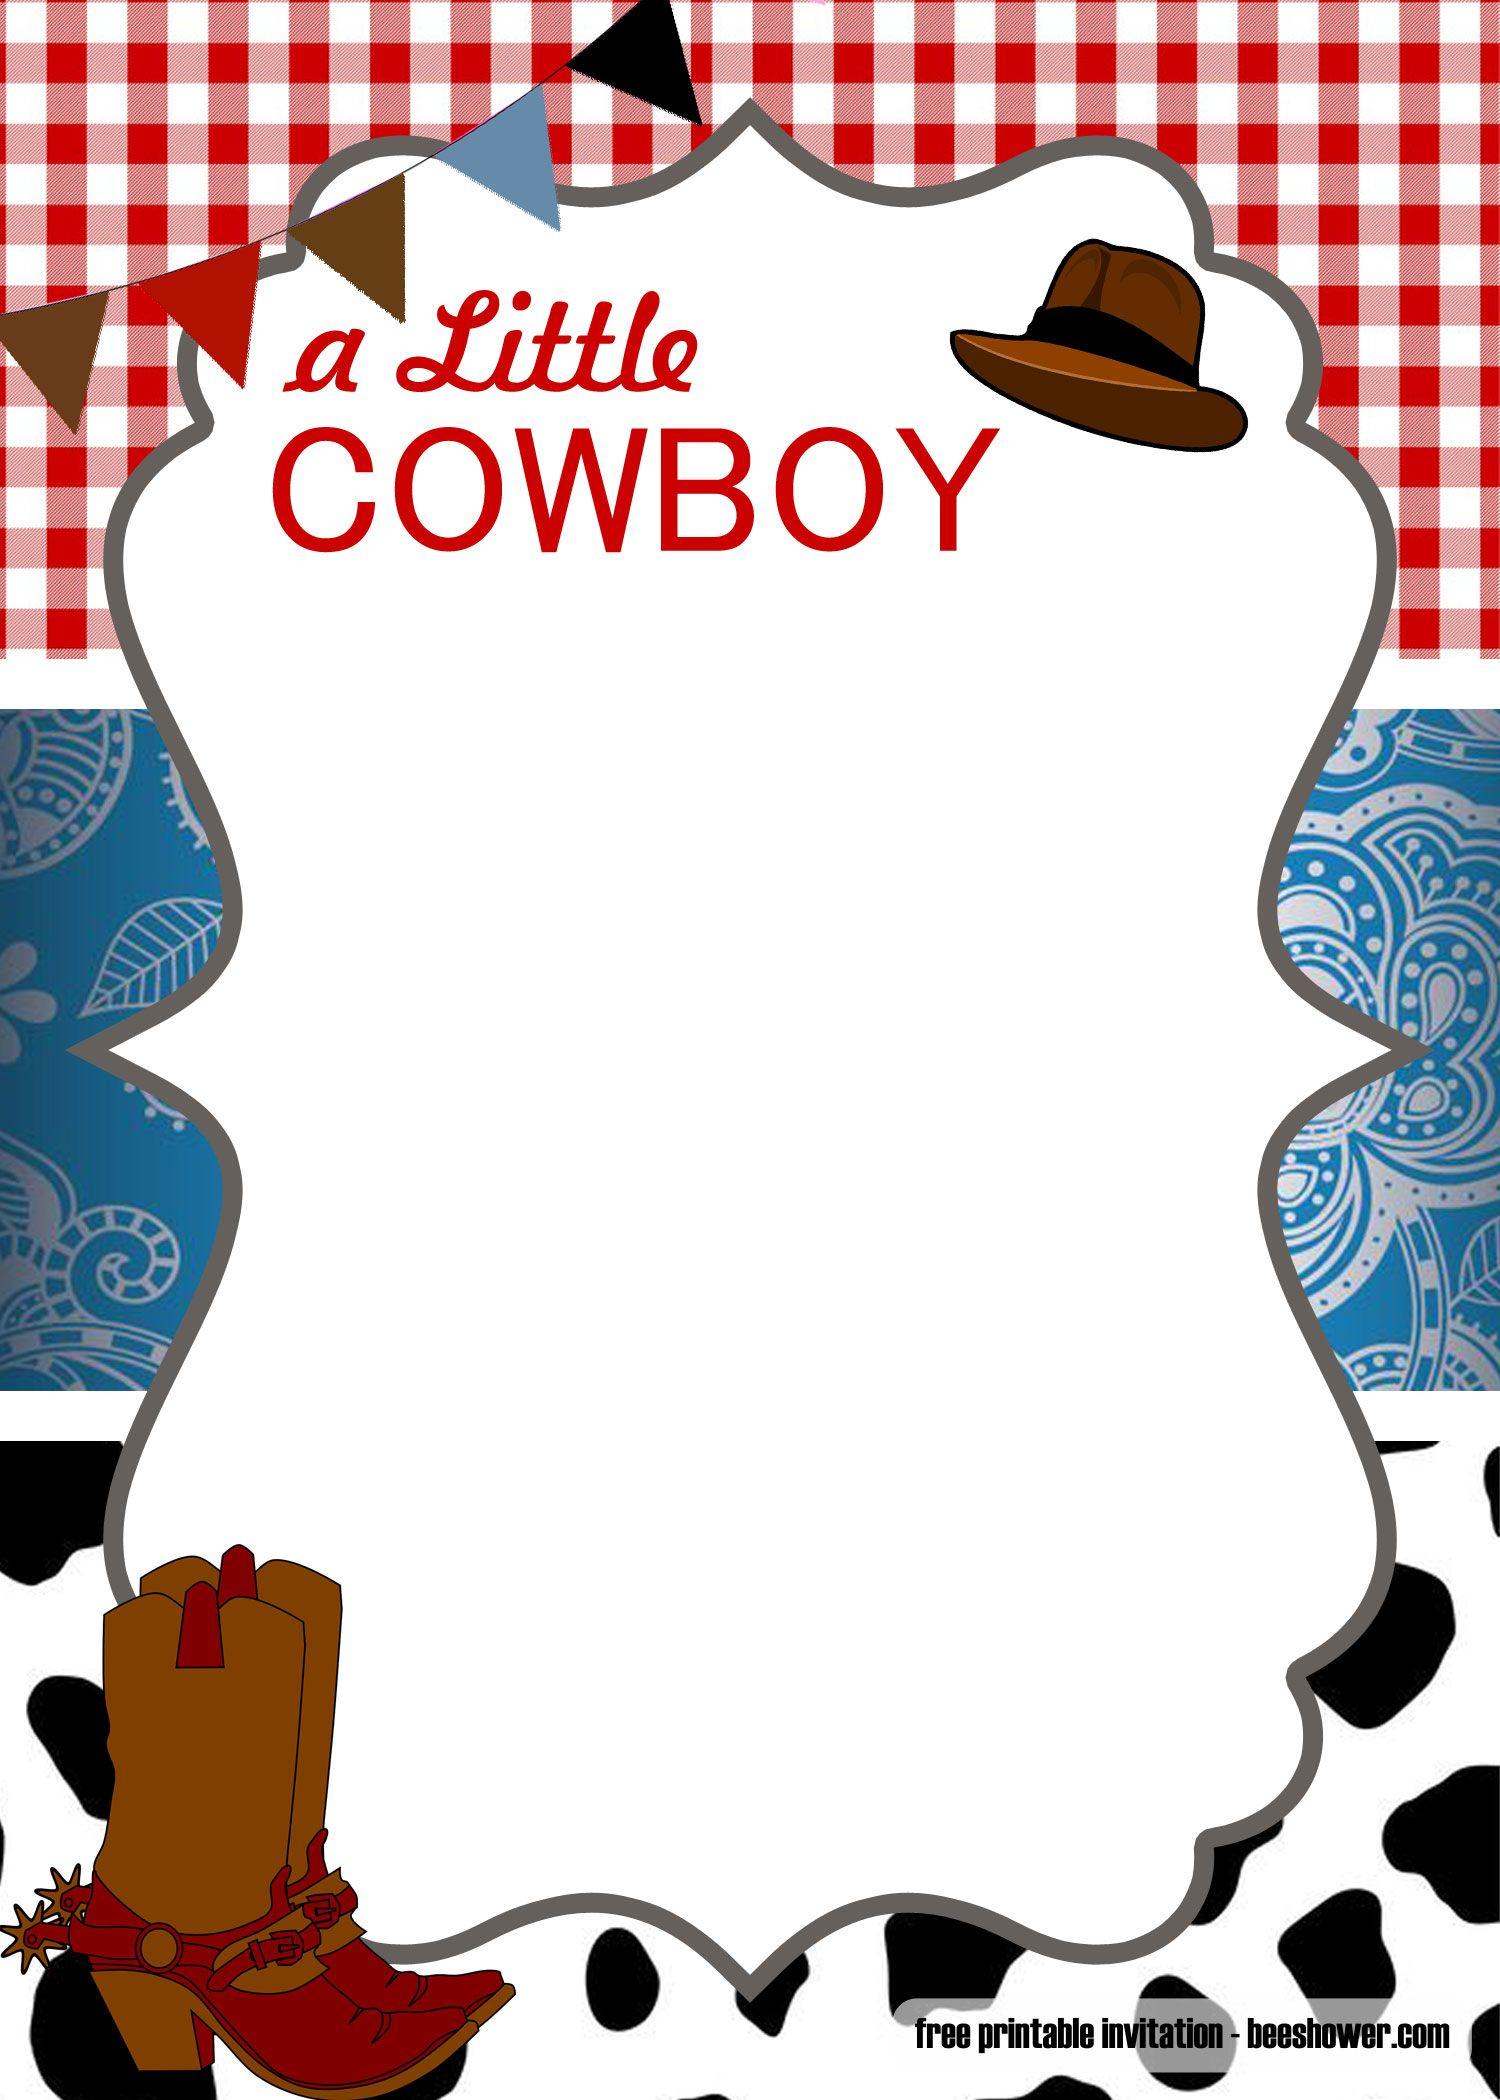 Free Free Cowboy Baby Shower Invitation Templates Cowboy Baby Shower Invitations Cowboy Invitations Cowboy Baby Shower